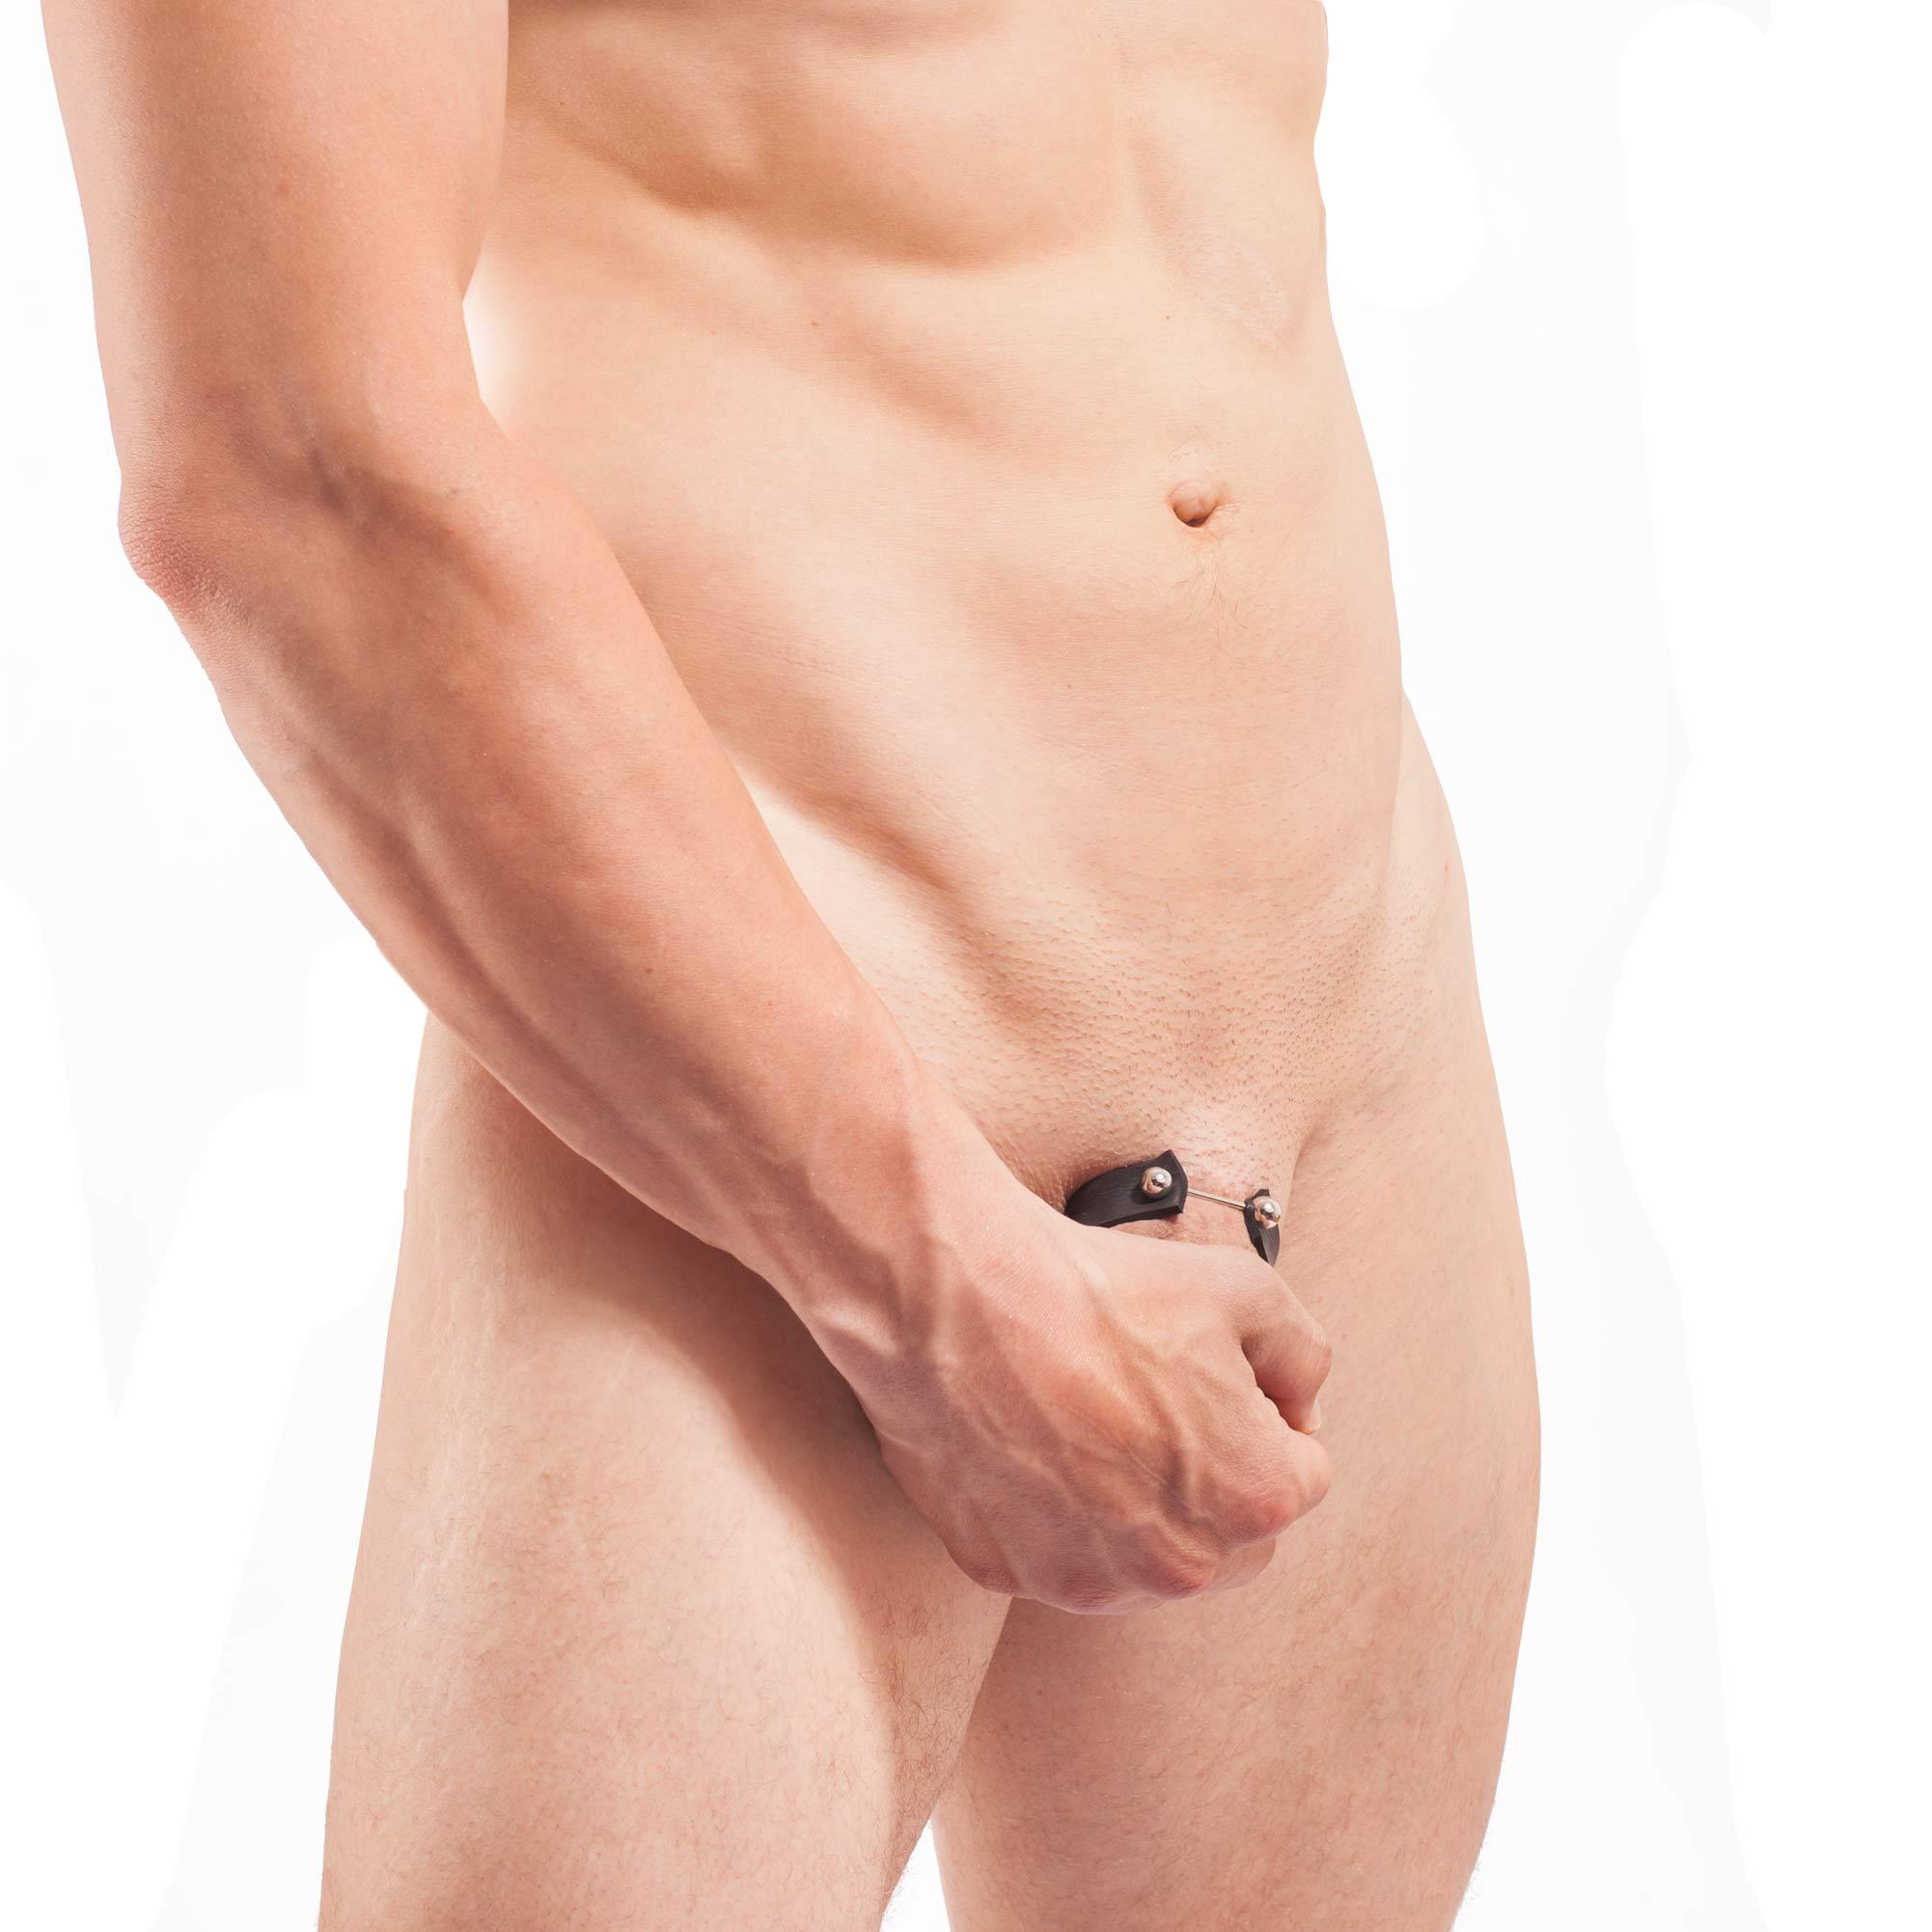 genital ring piercing